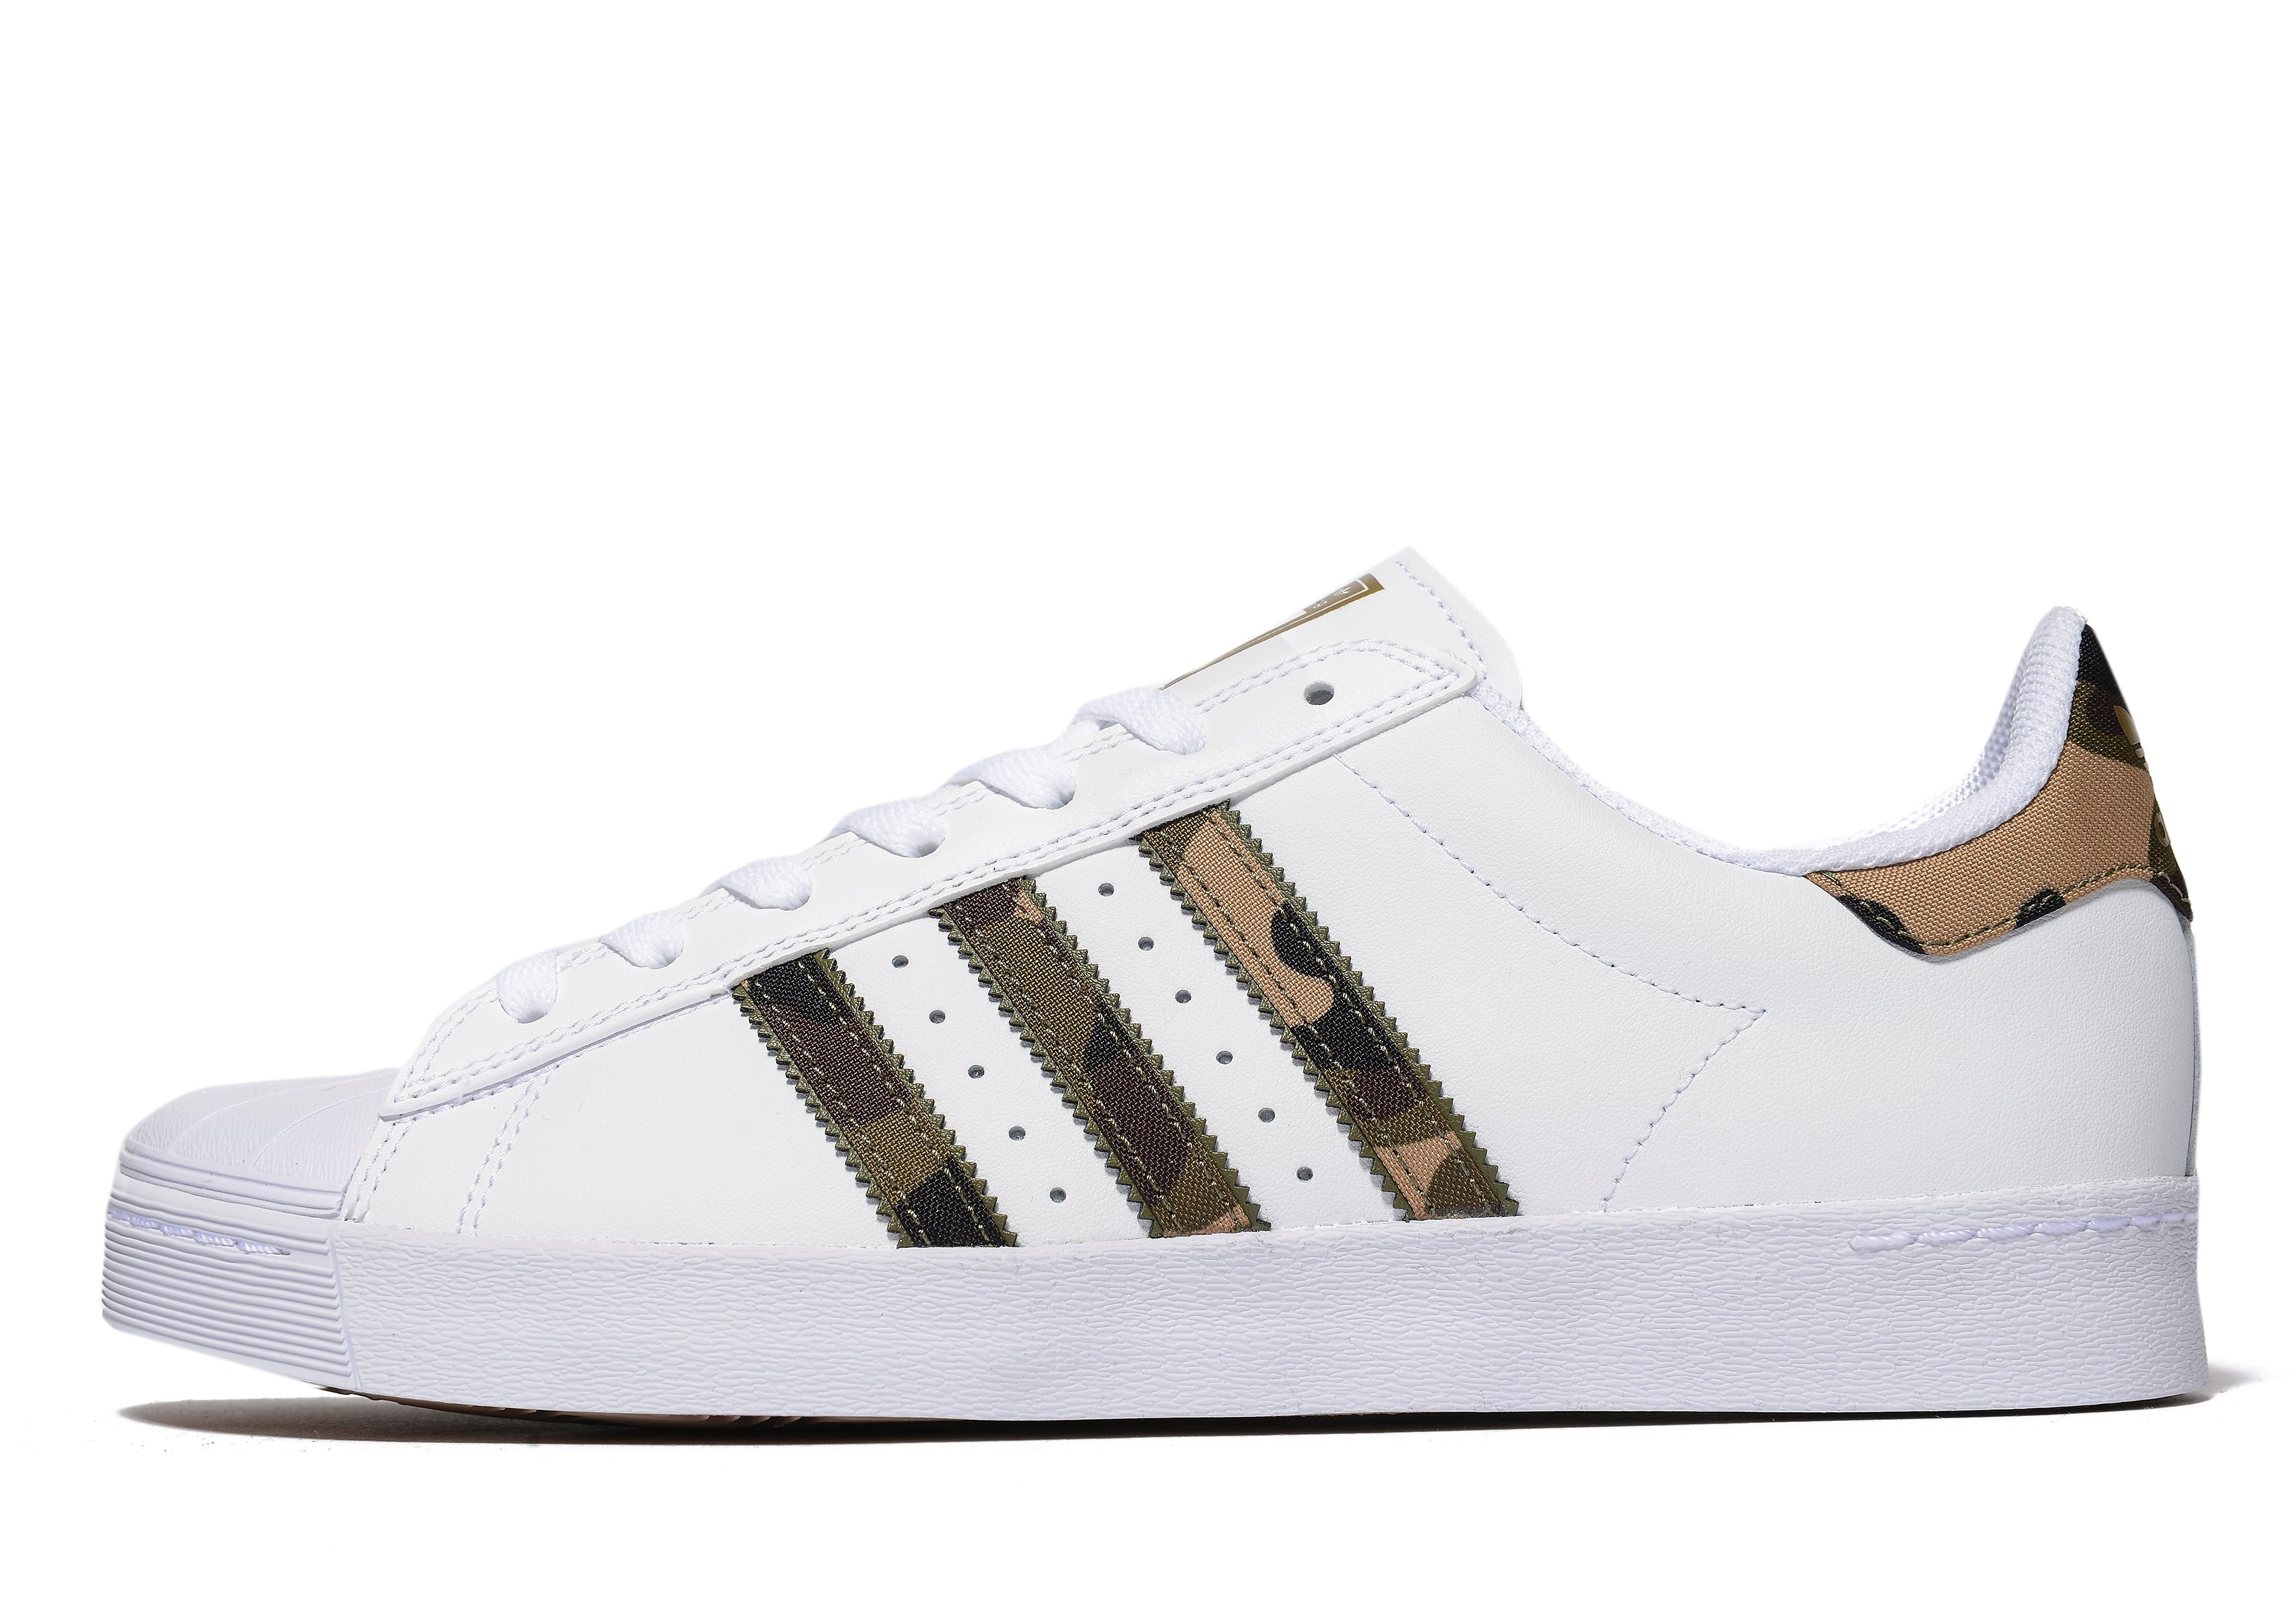 adidas Originals Superstar Vulc